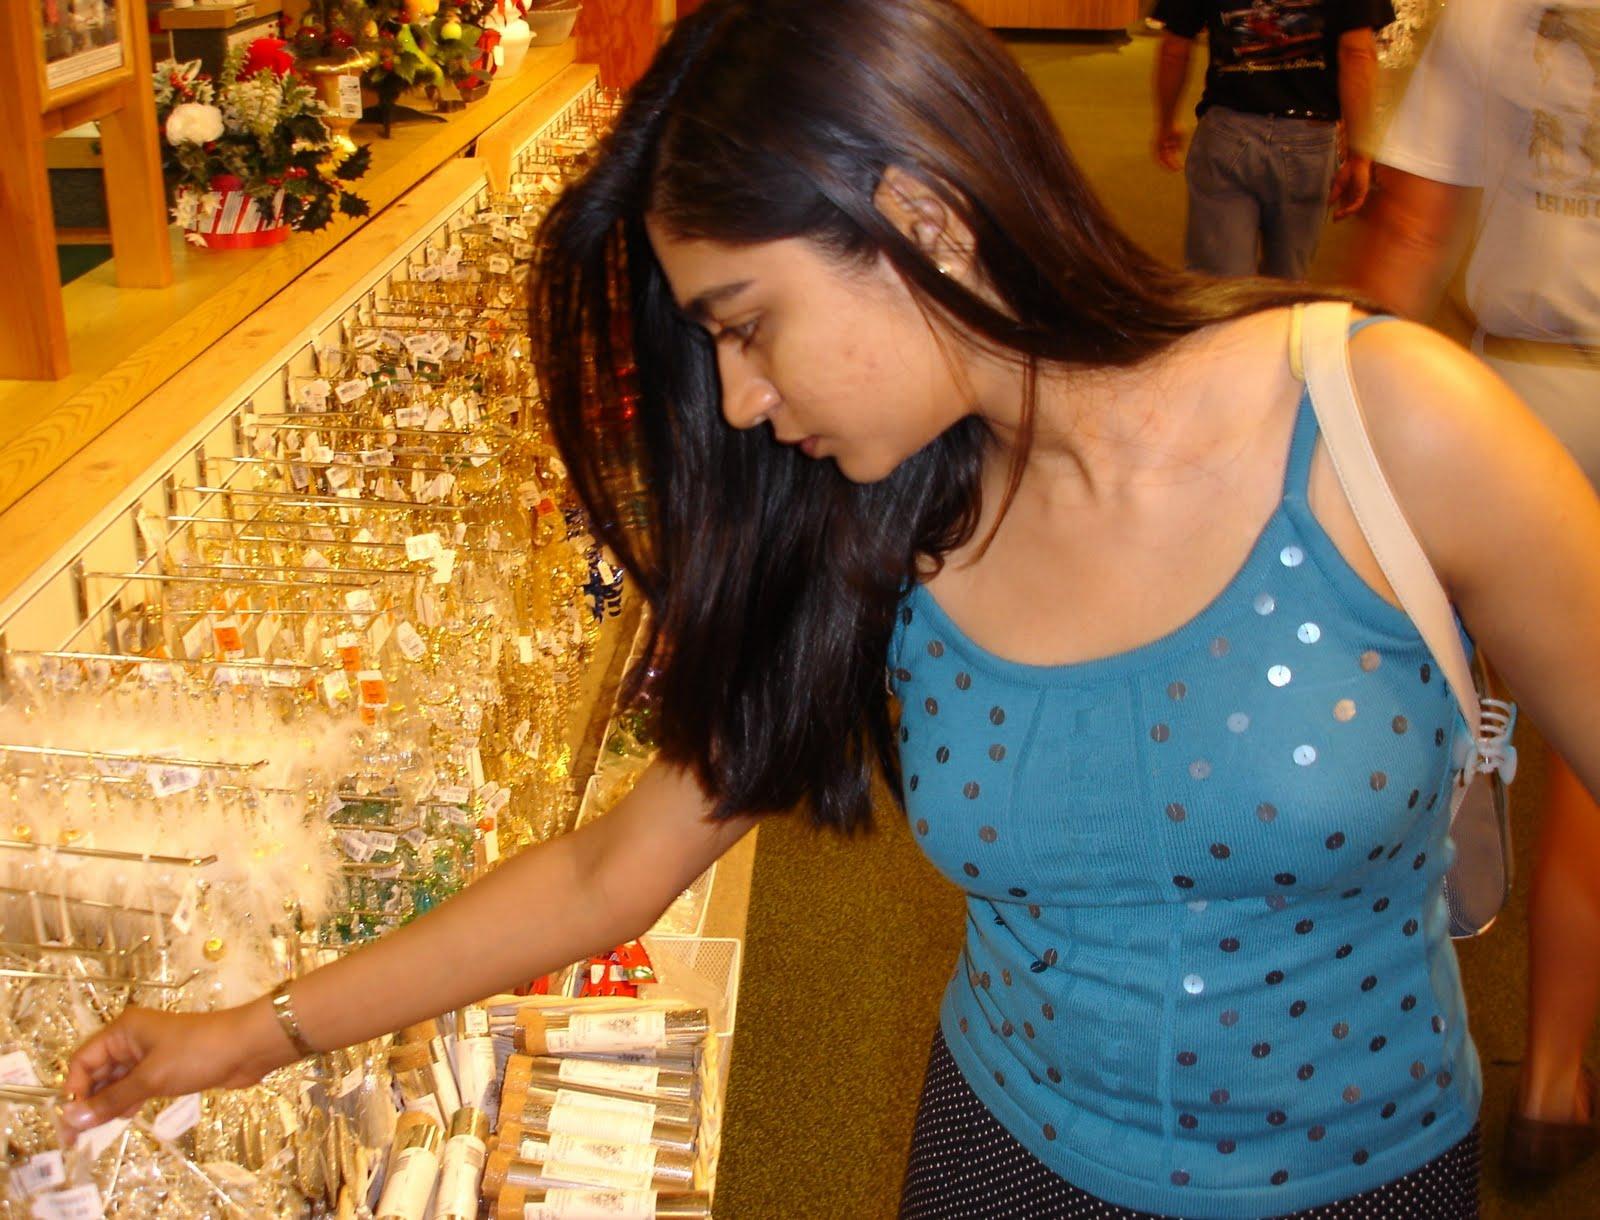 Mallu Aunties Photos Indian Hot Bhabhi Photo-5620